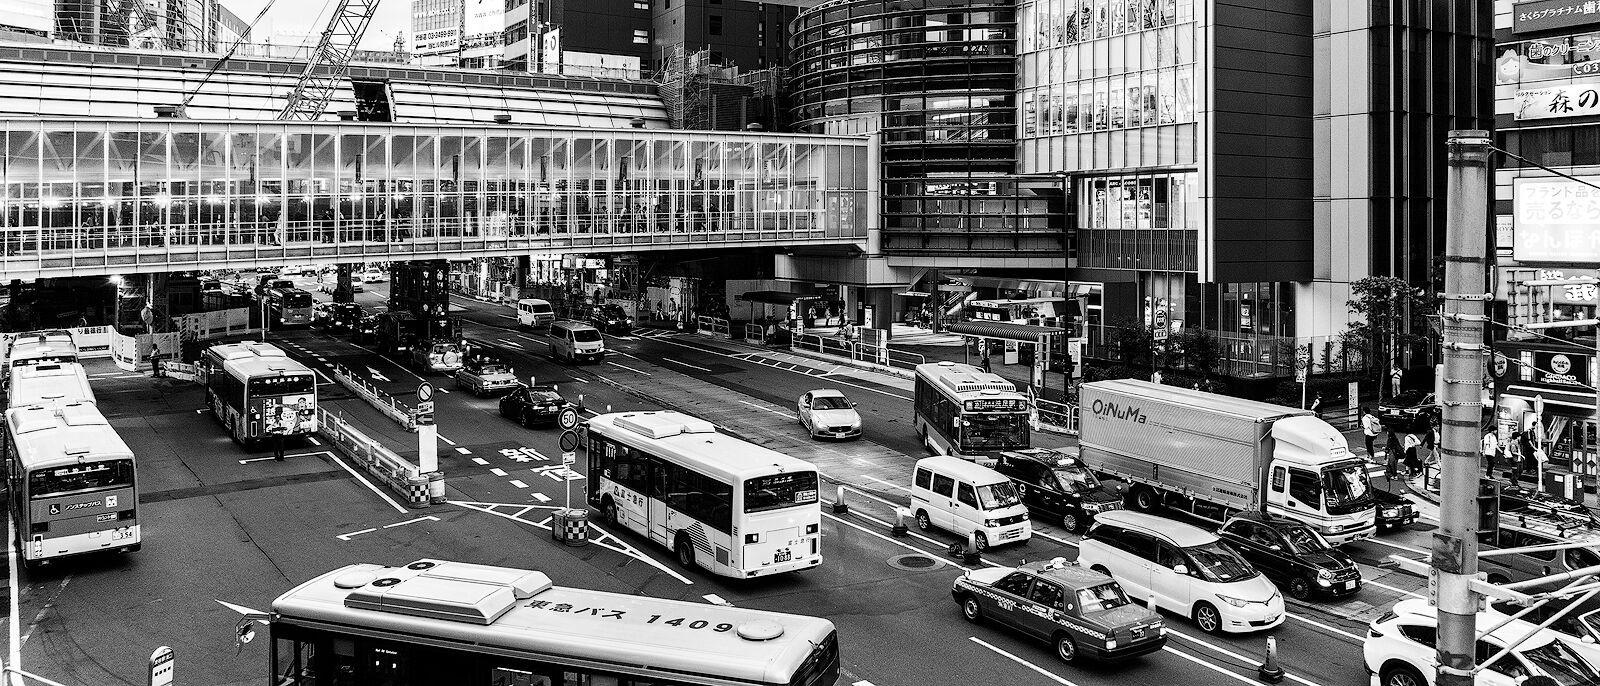 MONO - Tokyo Traffic by Wayne Donaldson ( 7.5 marks)